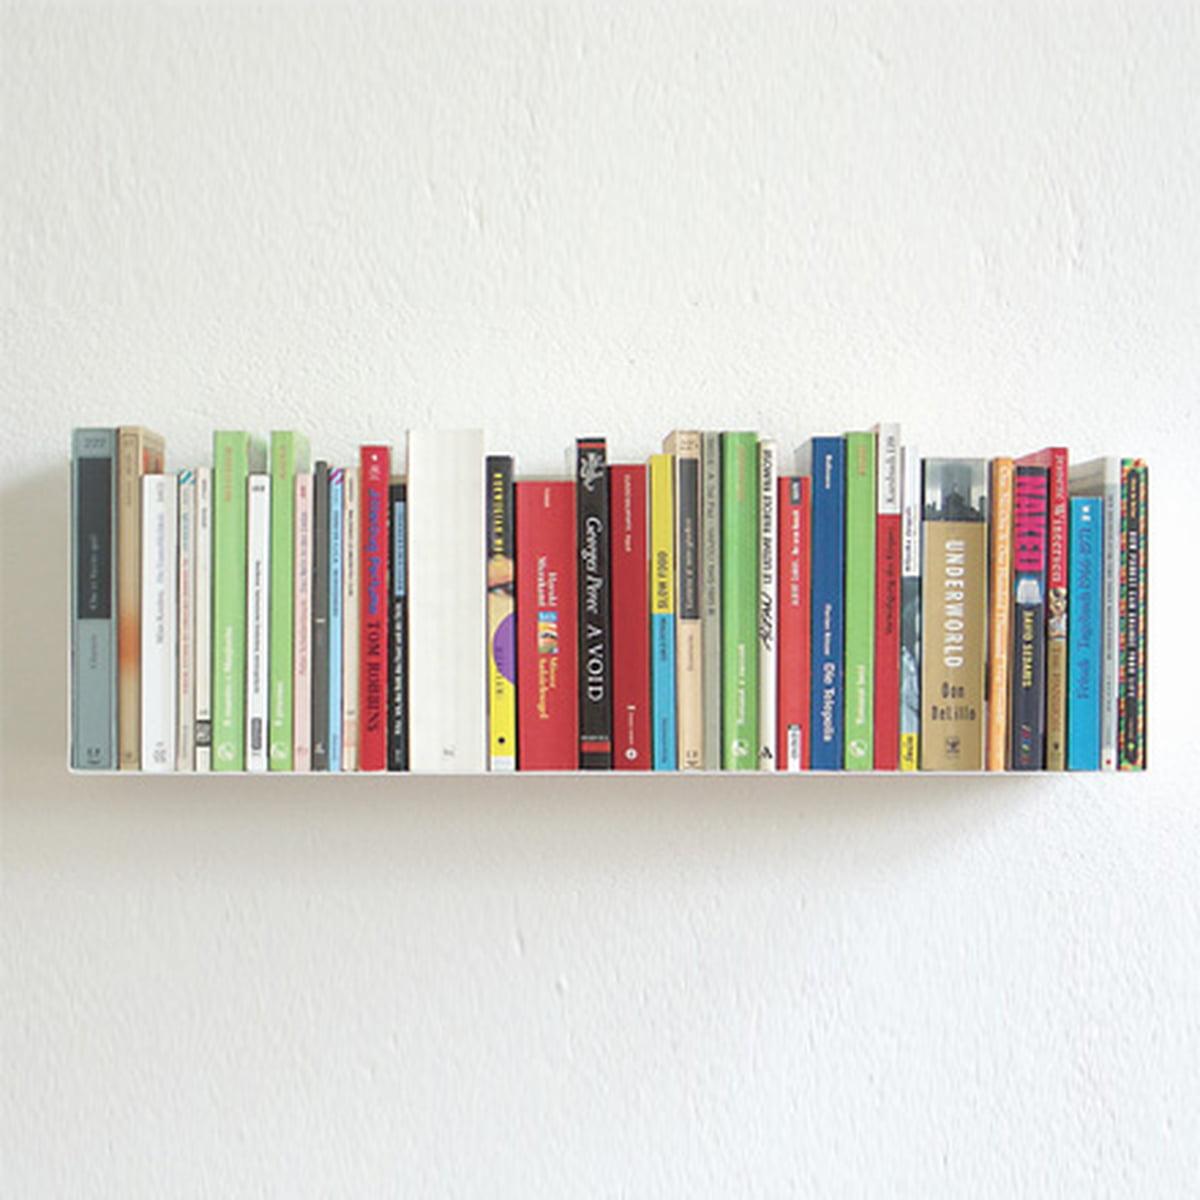 linea1 a Bücher und DVD Regal bei connox.at